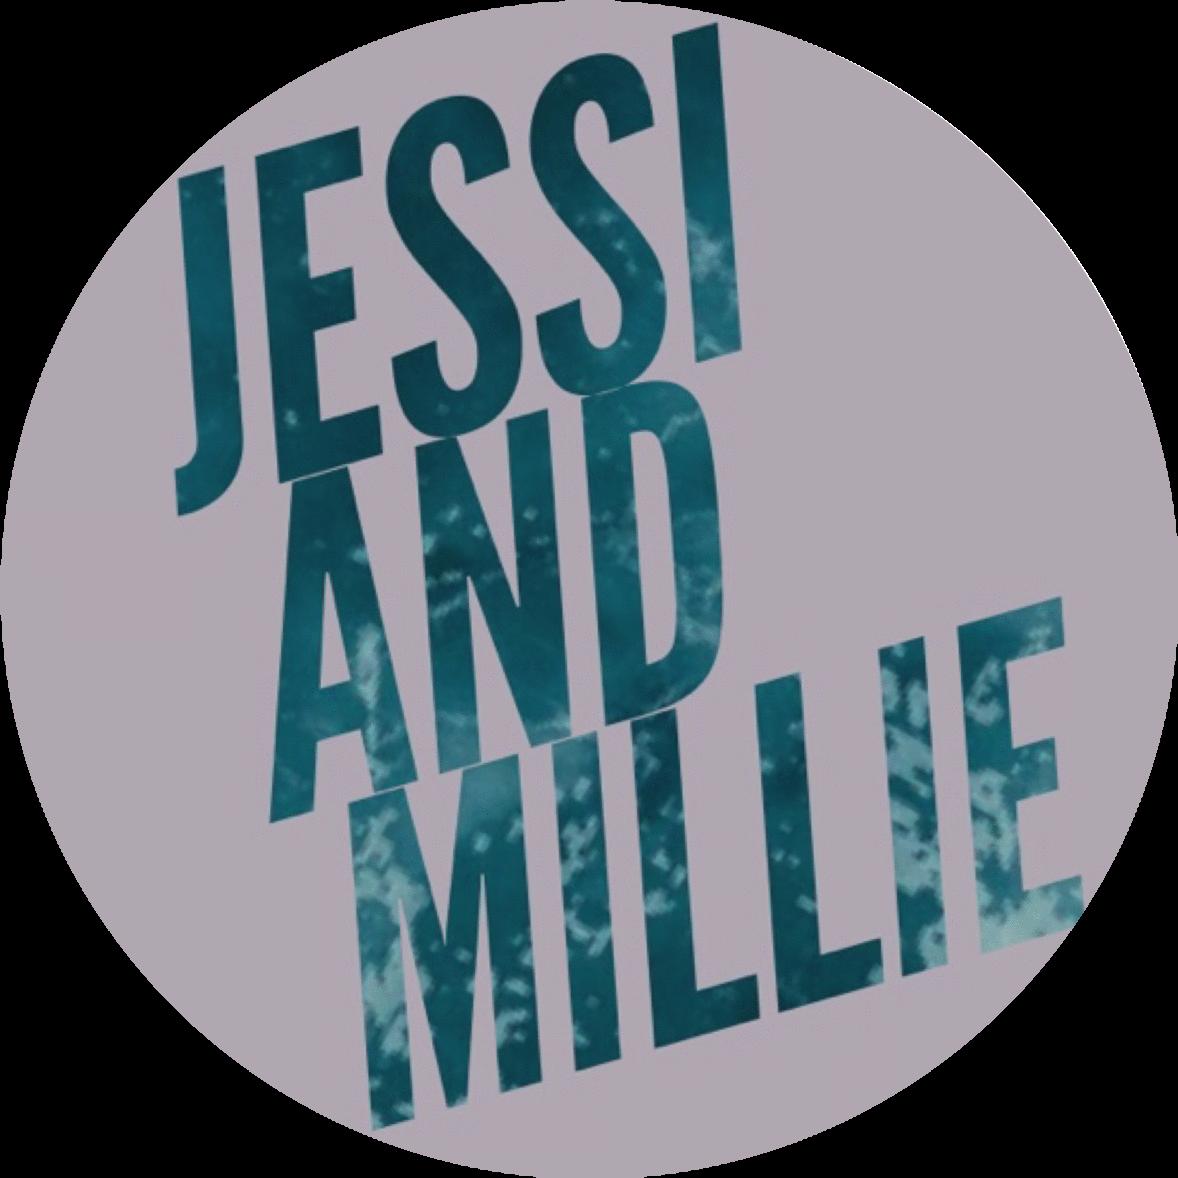 Jessi and Millie